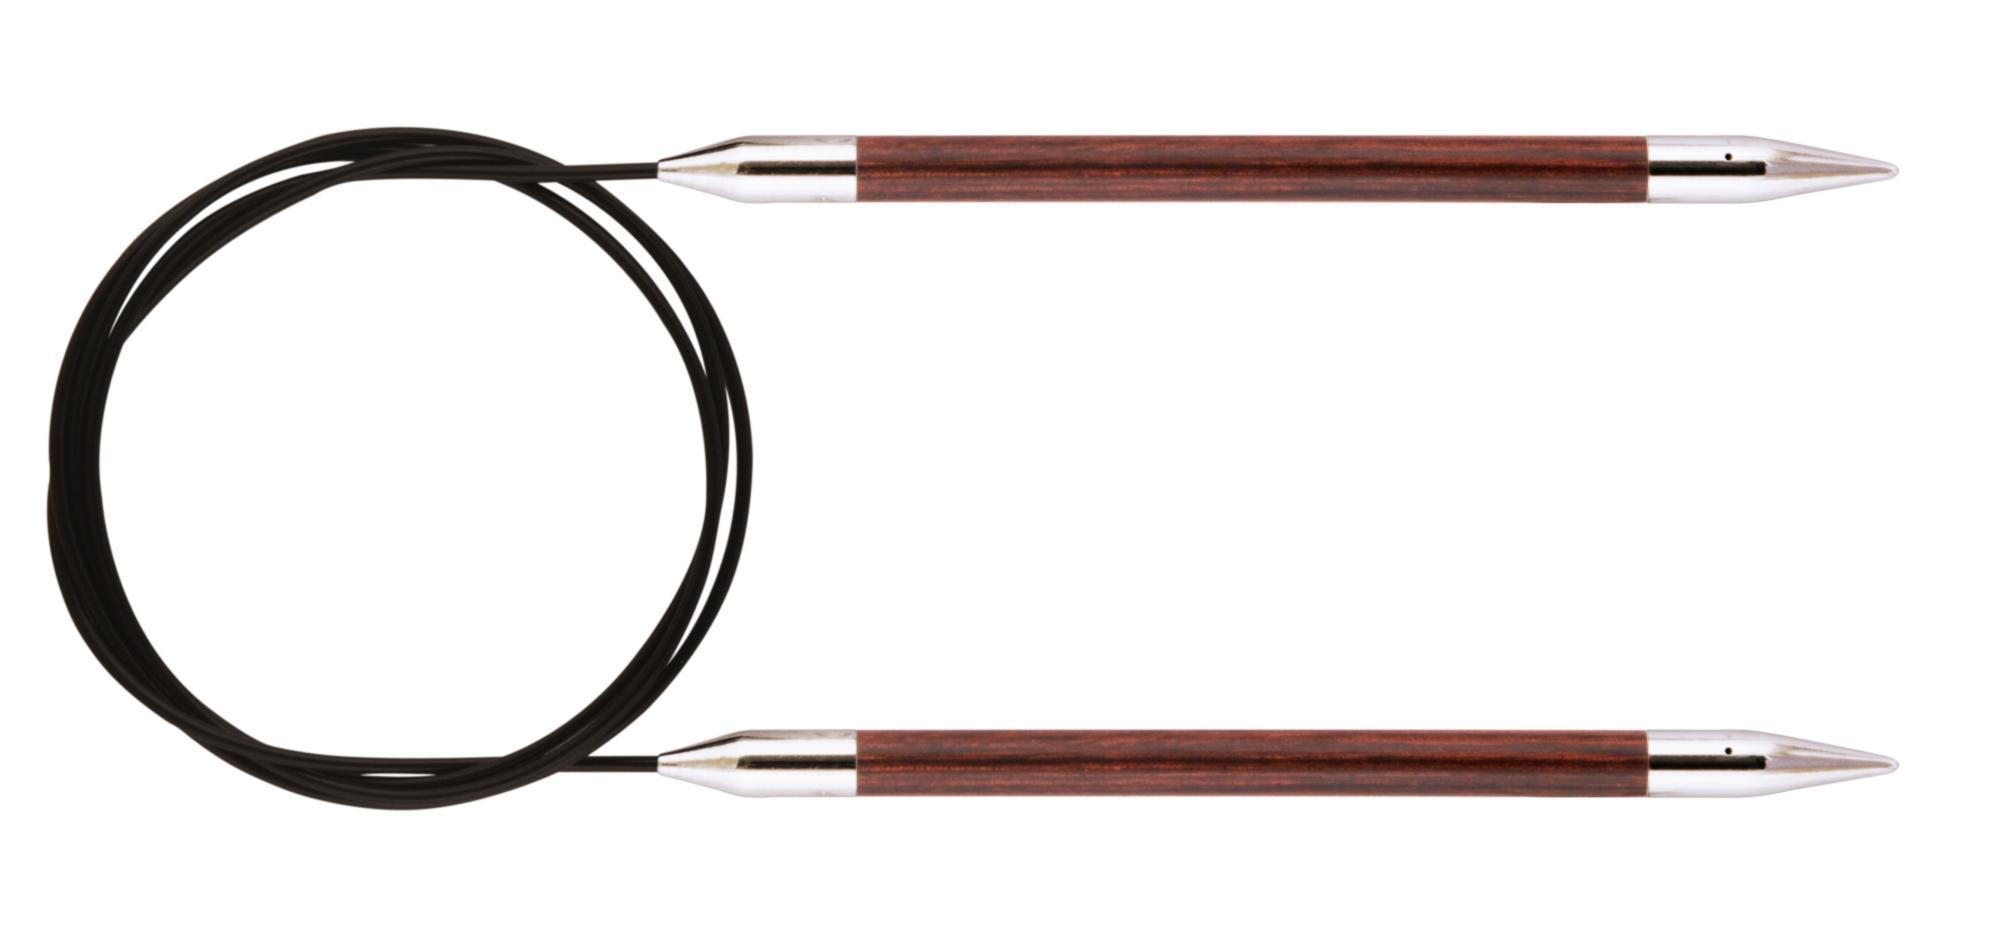 Спицы круговые 40 см Royale KnitPro, 29061, 7.00 мм